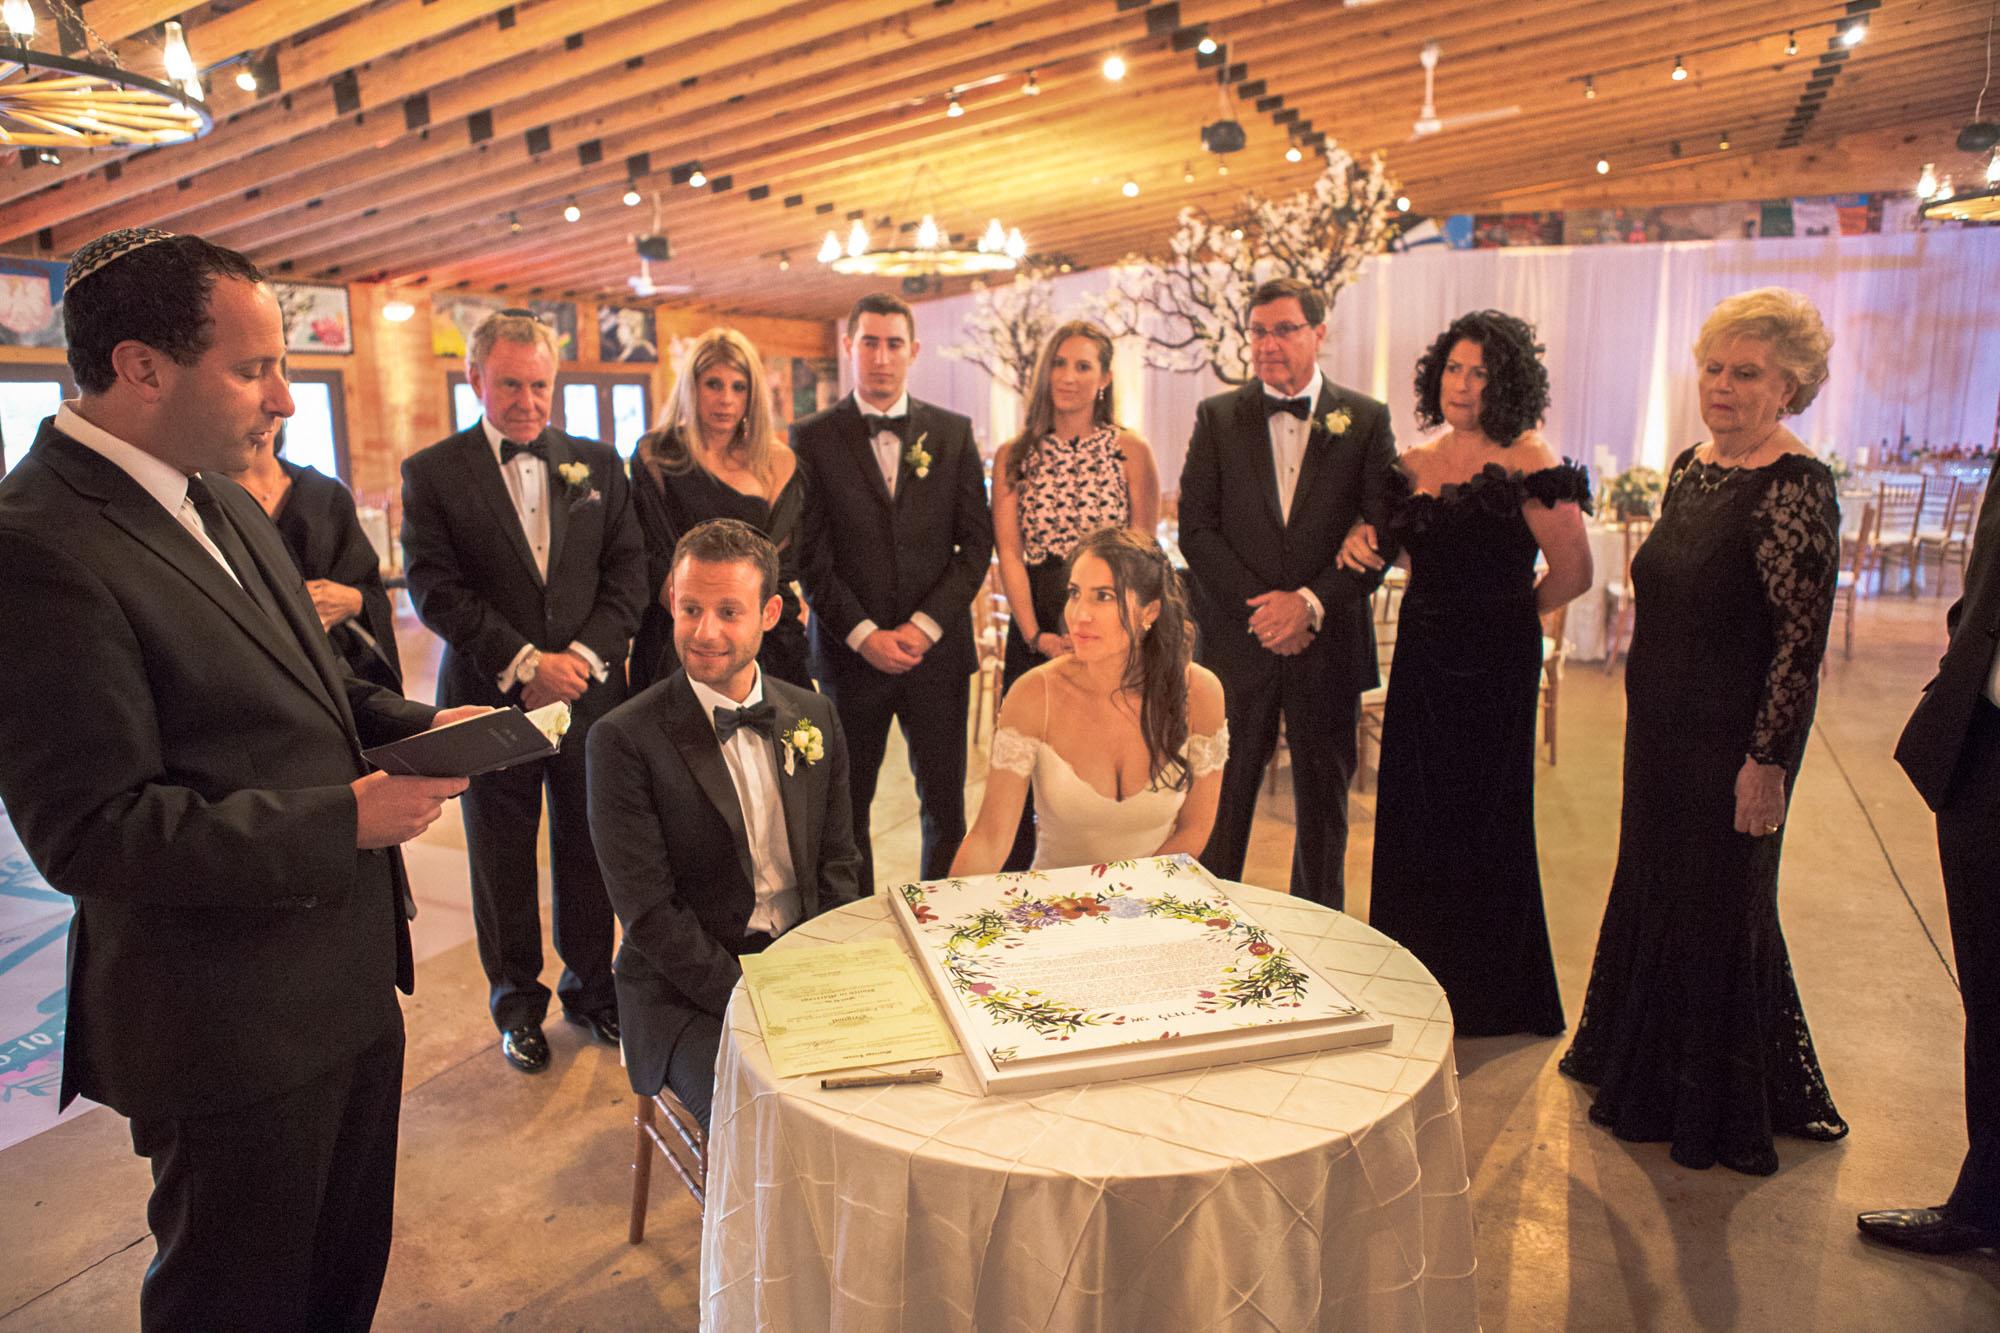 scranton_wedding_photographer_lettieri_pa (25 of 34).jpg